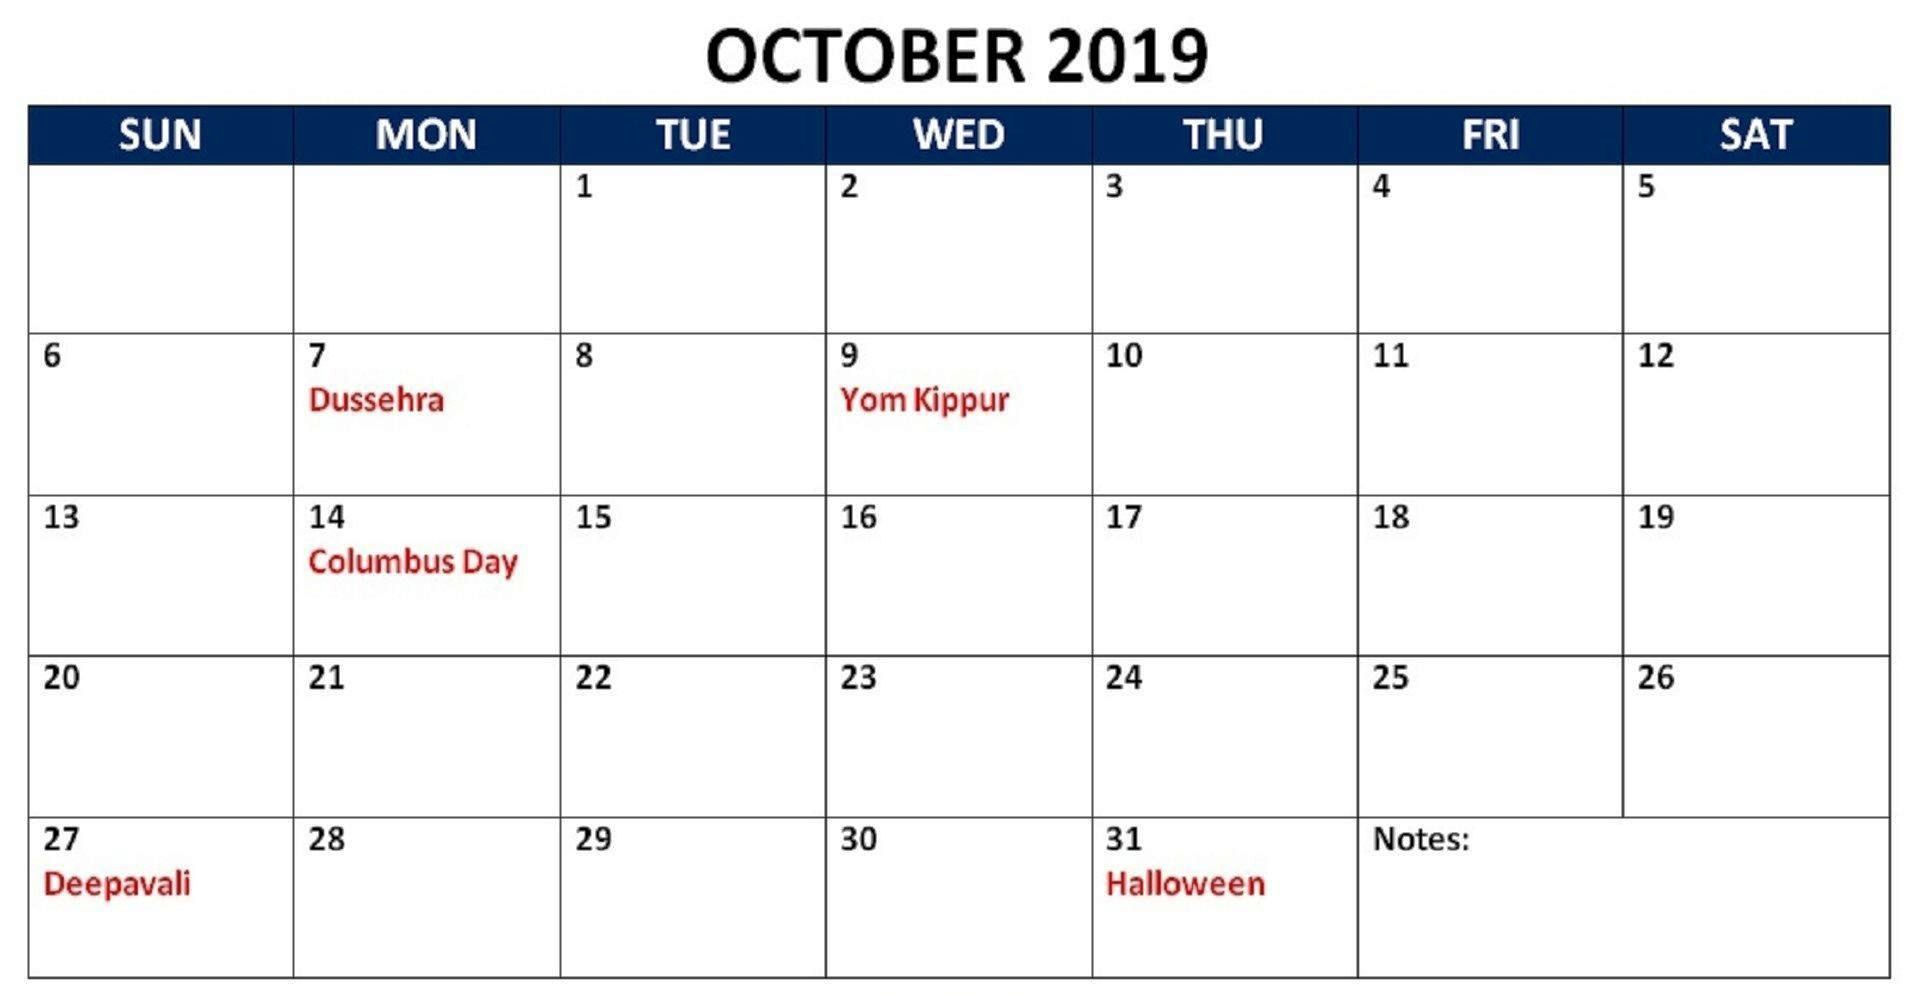 October 2019 Calendar Holidays